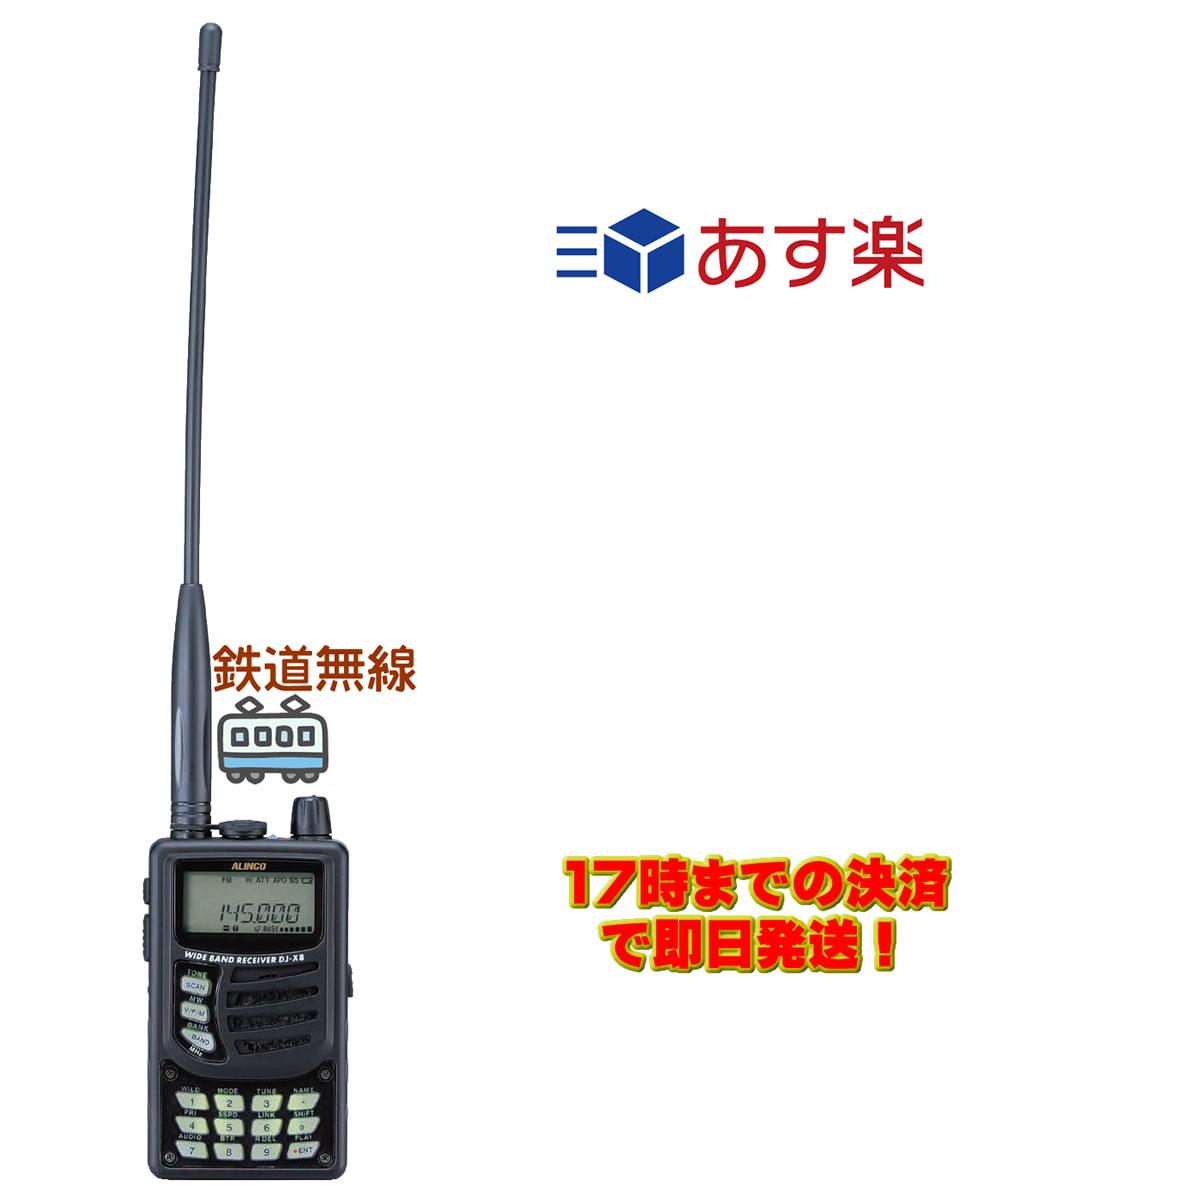 DJ-X8 鉄道無線SPECIAL アルインコ ワイドバンドレシーバー